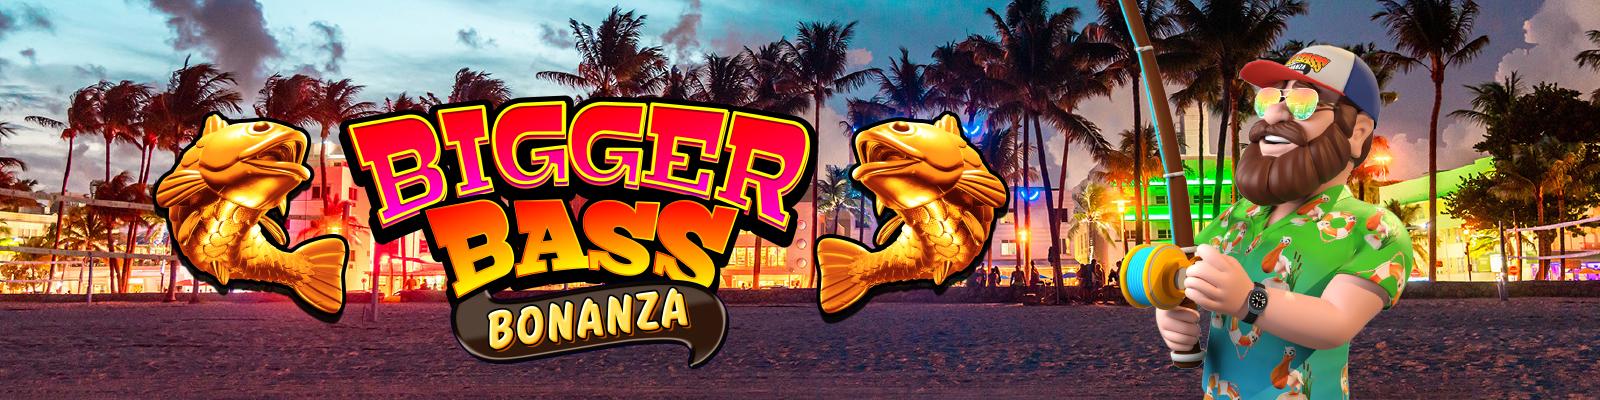 Bigger Bass Bonanza – Pragmatic Play